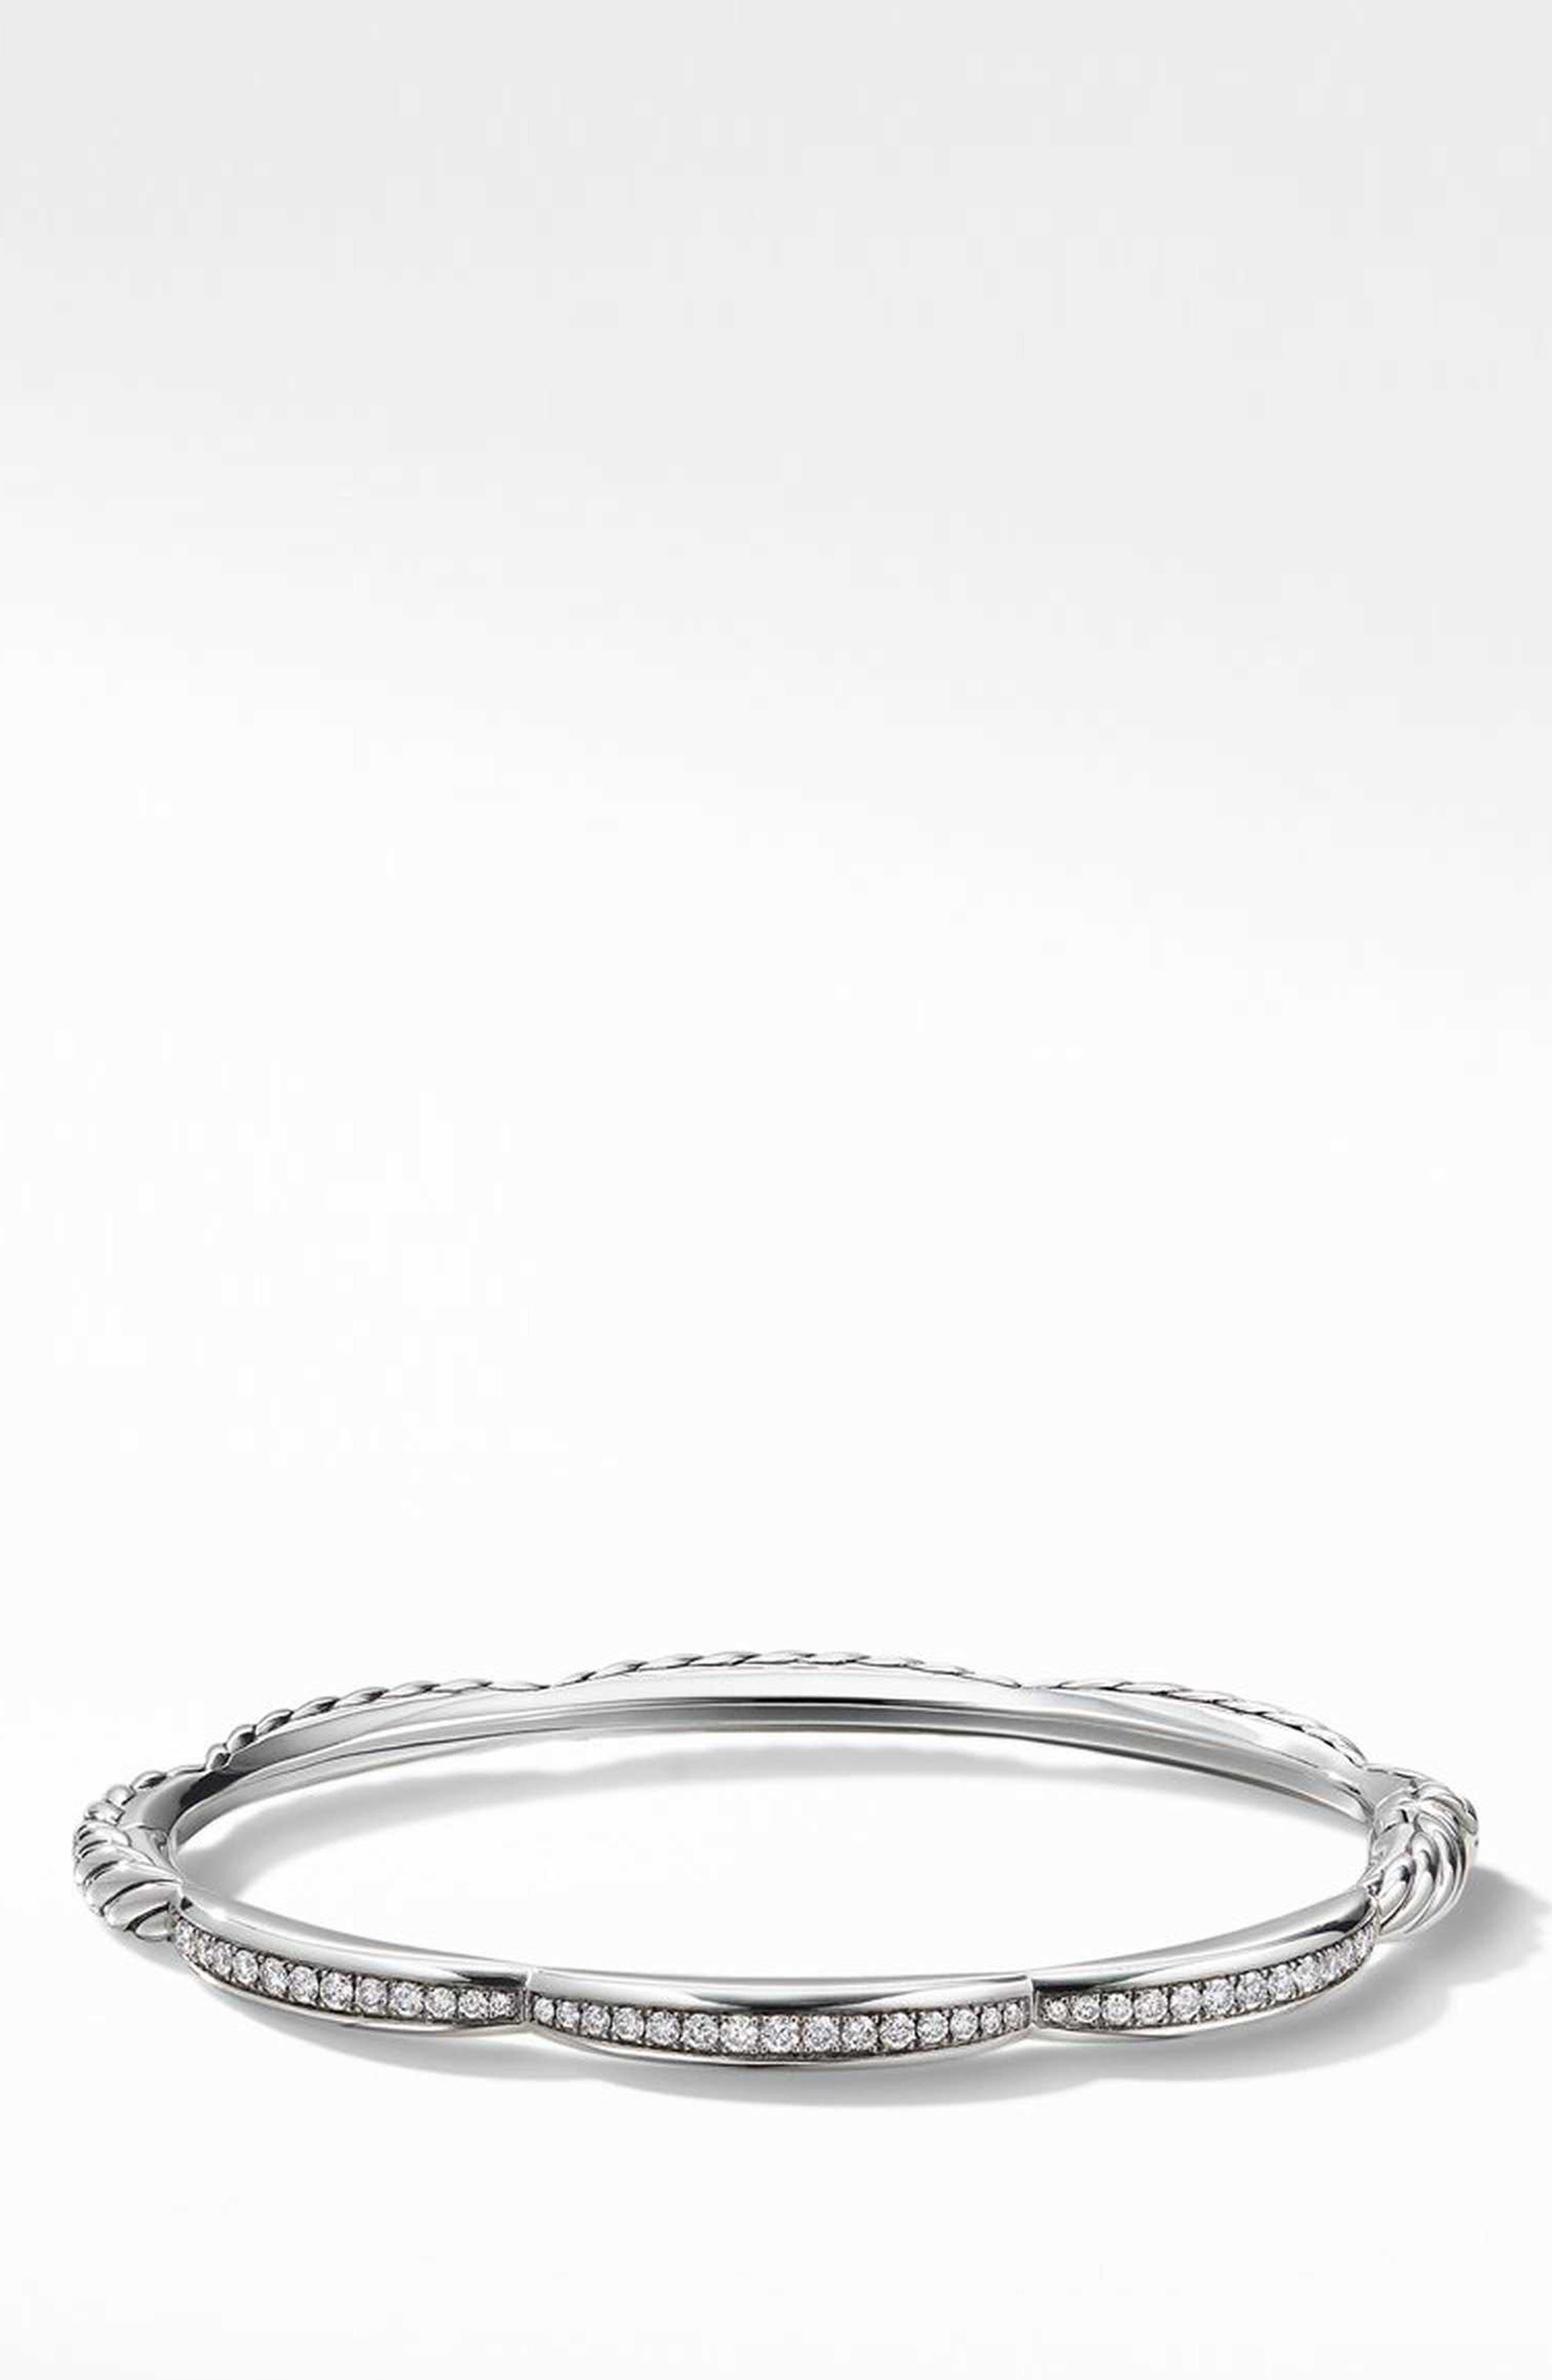 Tides 3-Station Bracelet with Diamonds,                         Main,                         color, STERLING SILVER/ DIAMOND